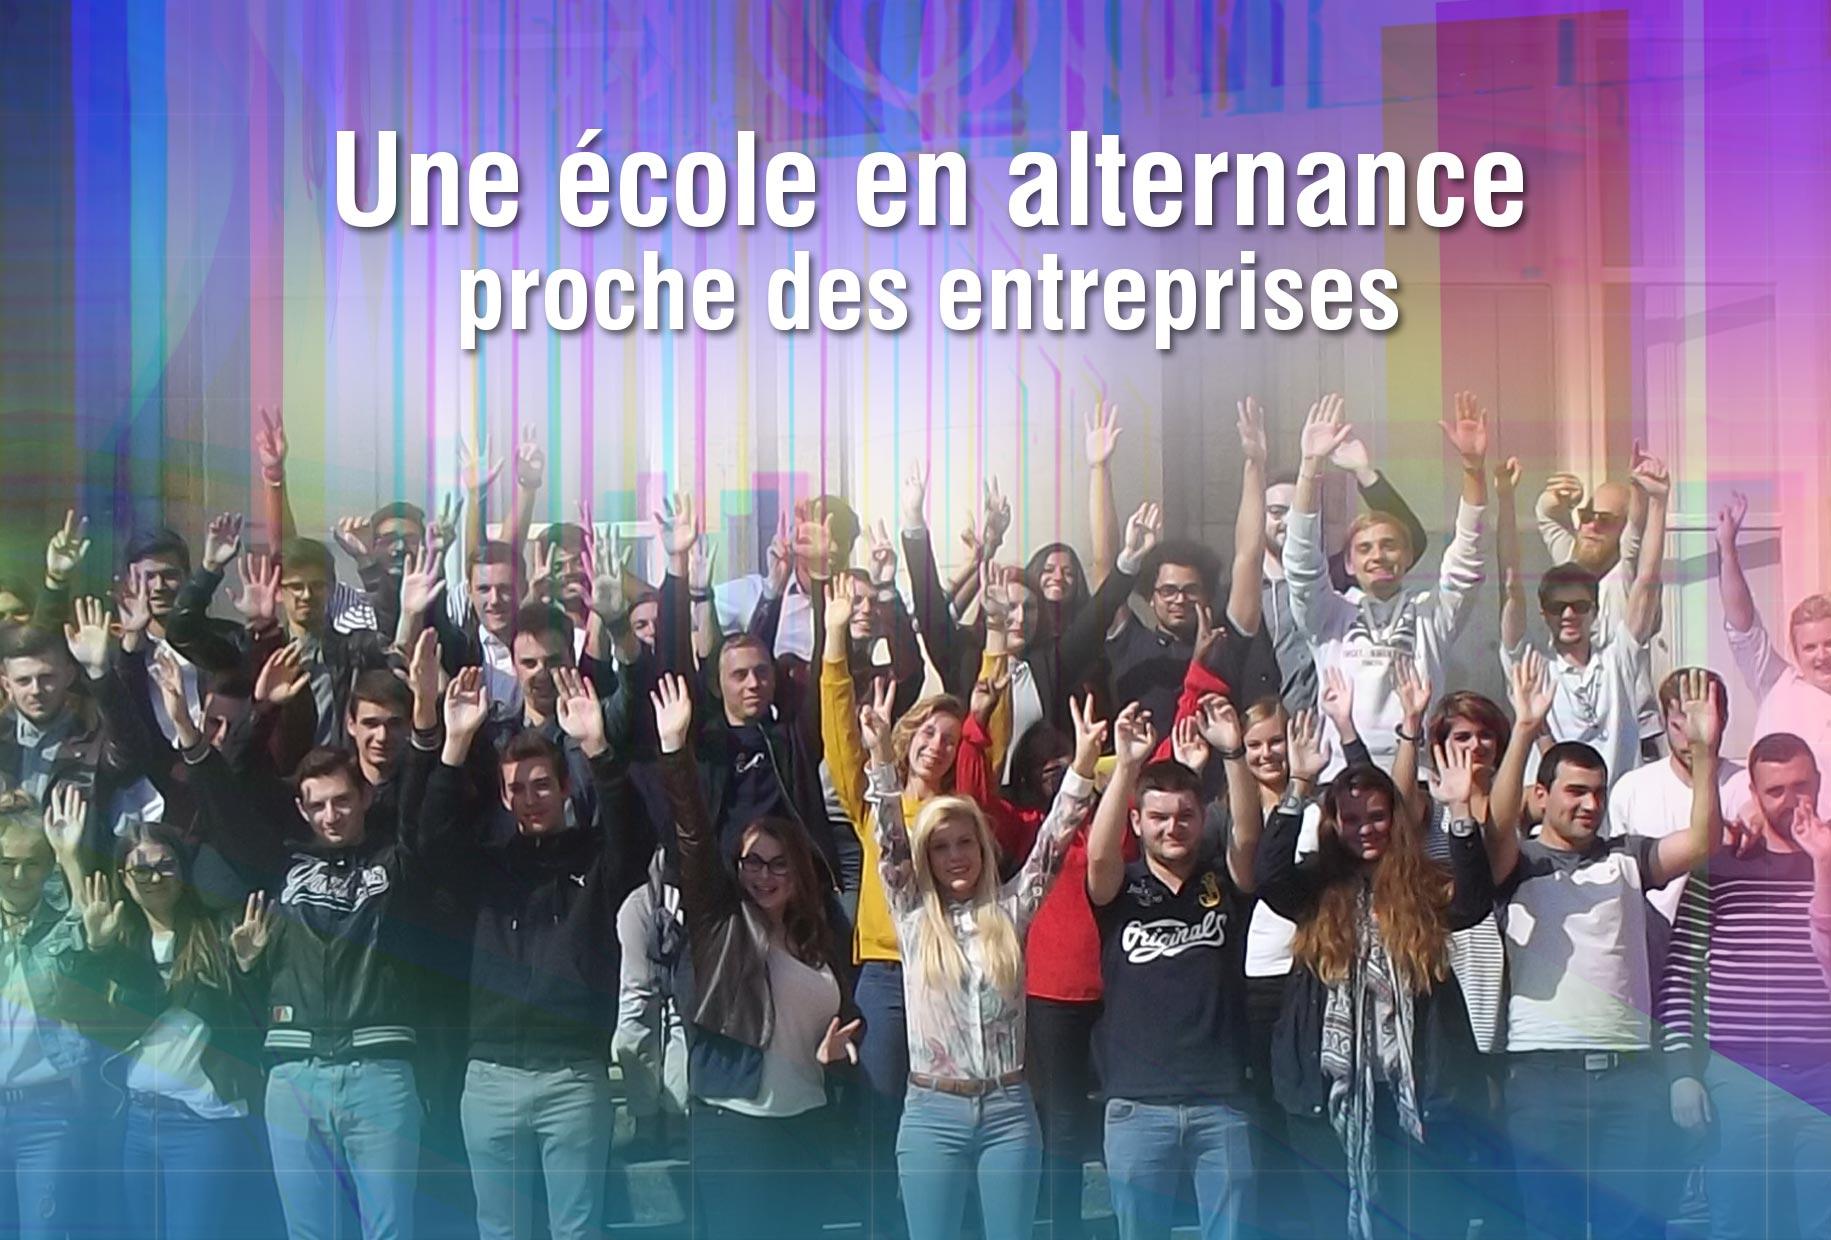 ESCC-Ecole-en-alternance